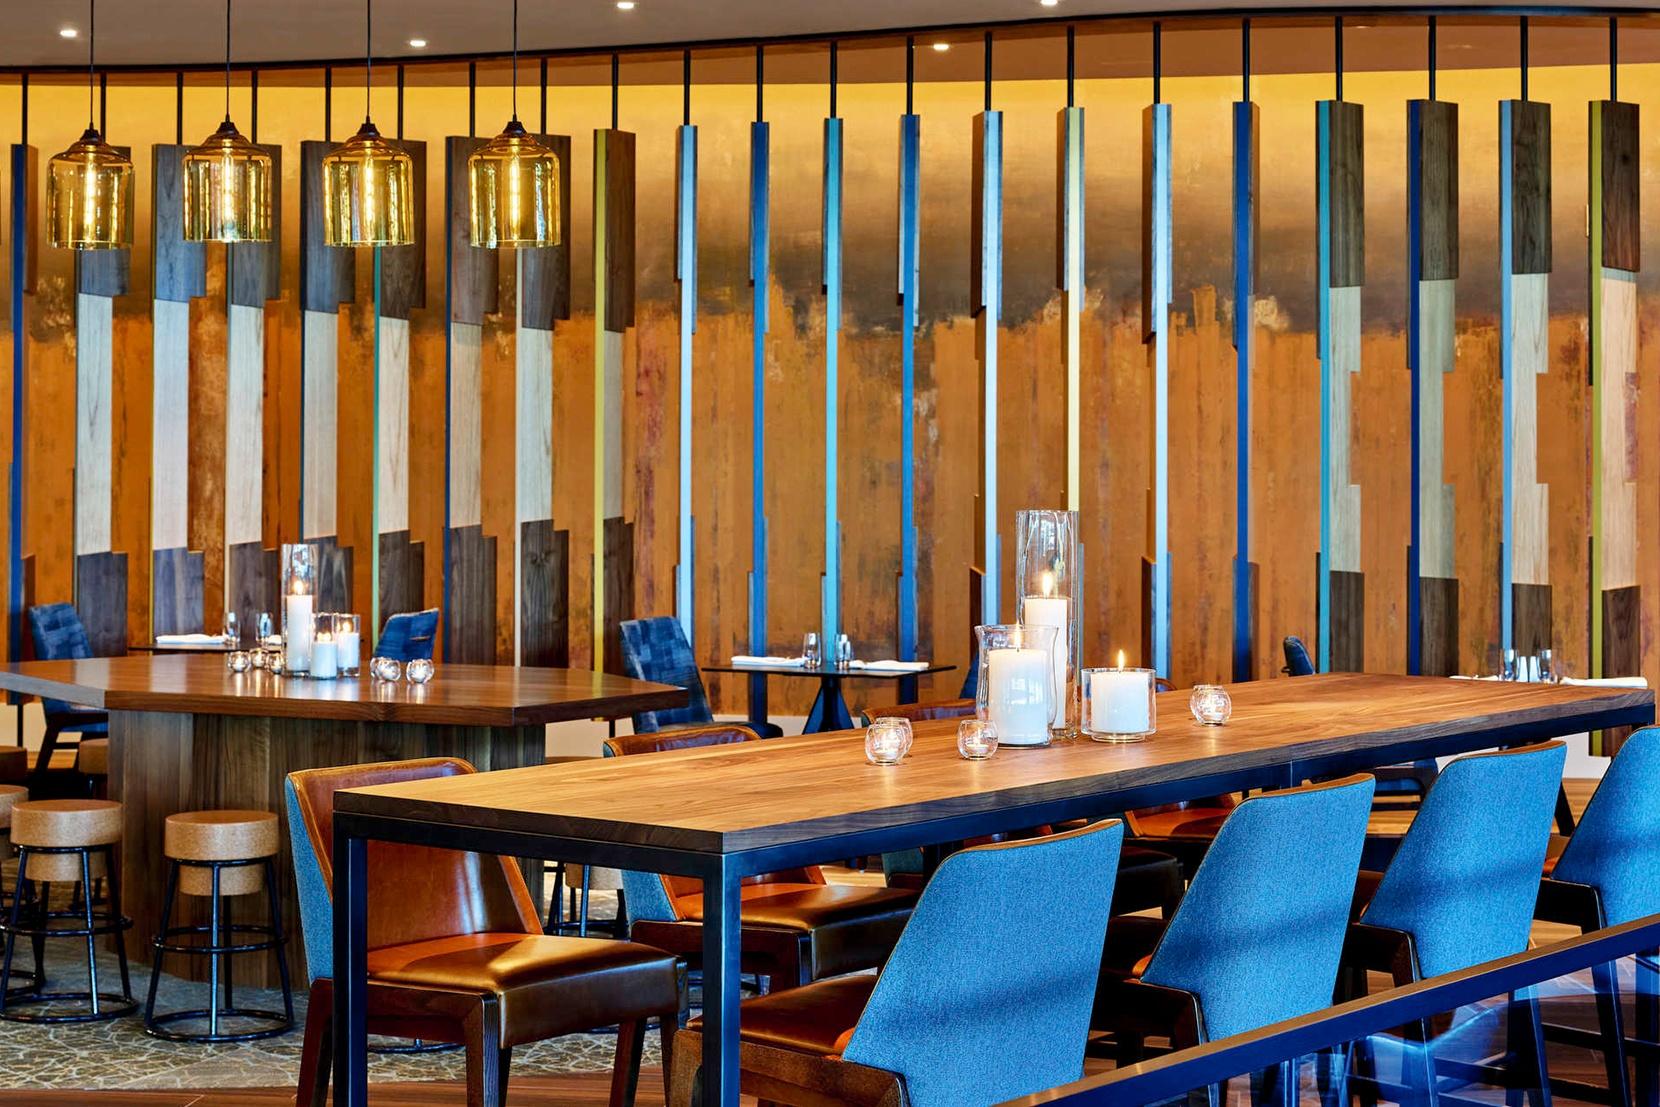 Modern-Hotel-Lighting-Linear-5-Bell-Jar.jpg